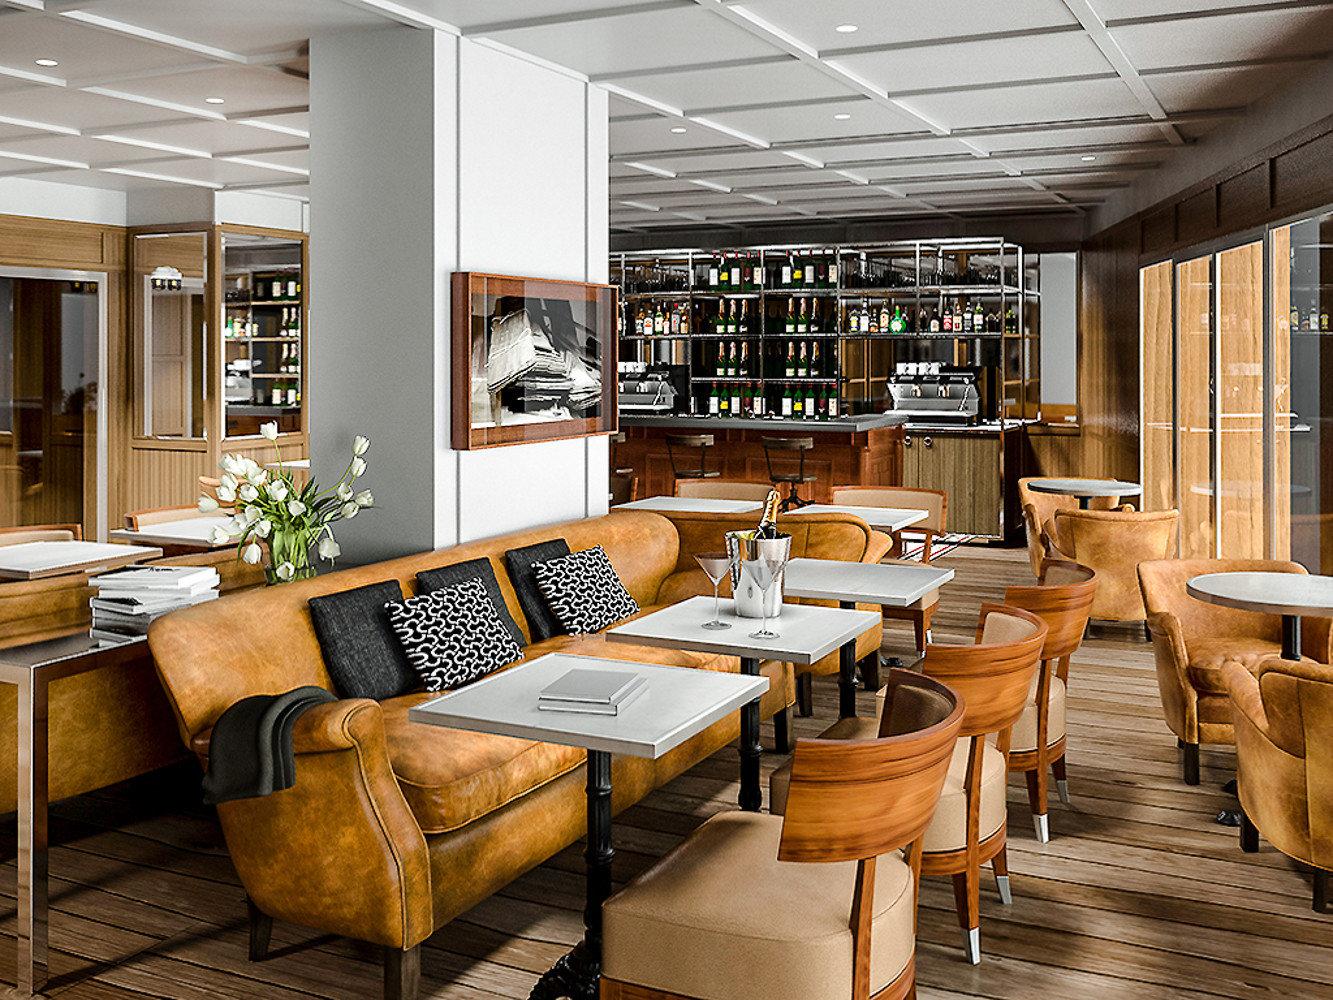 Boutique Hotels Hotels Luxury Travel indoor floor table chair room ceiling window interior design furniture restaurant café area several